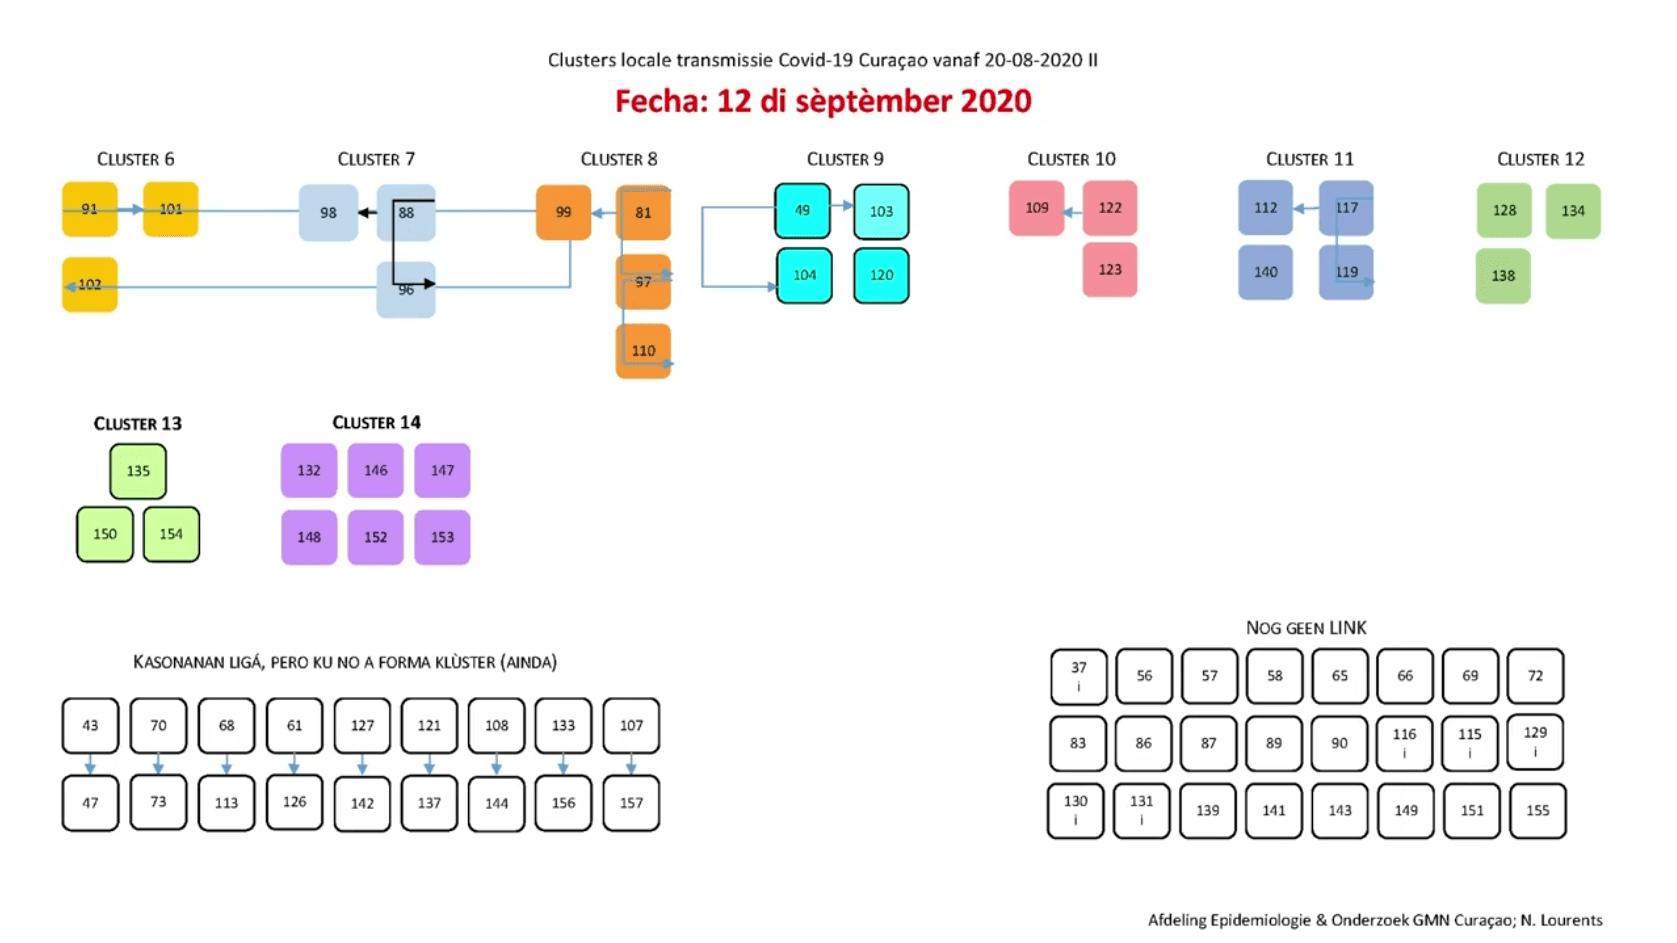 corona cluster curacao (deel 2)